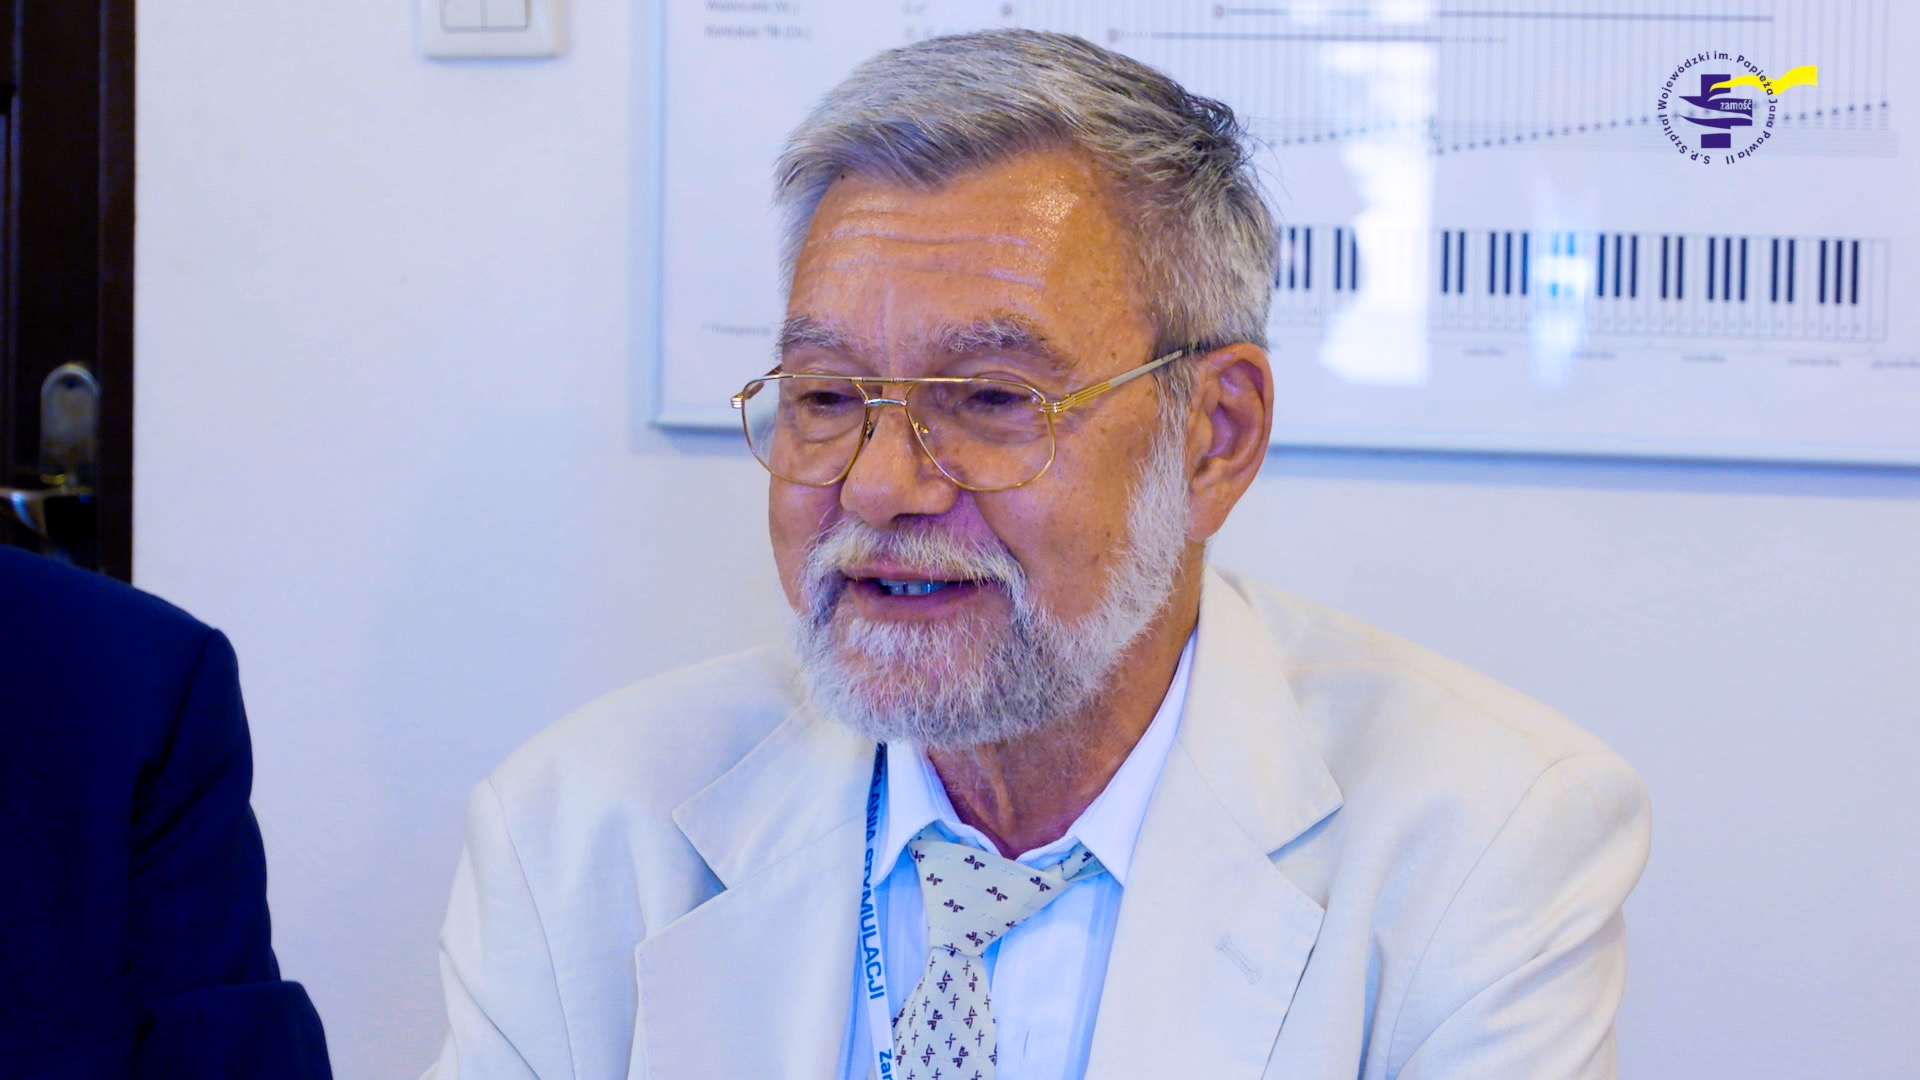 prof a kutarski Profesor Kutarski odznaczony Orderem Odrodzenia Polski